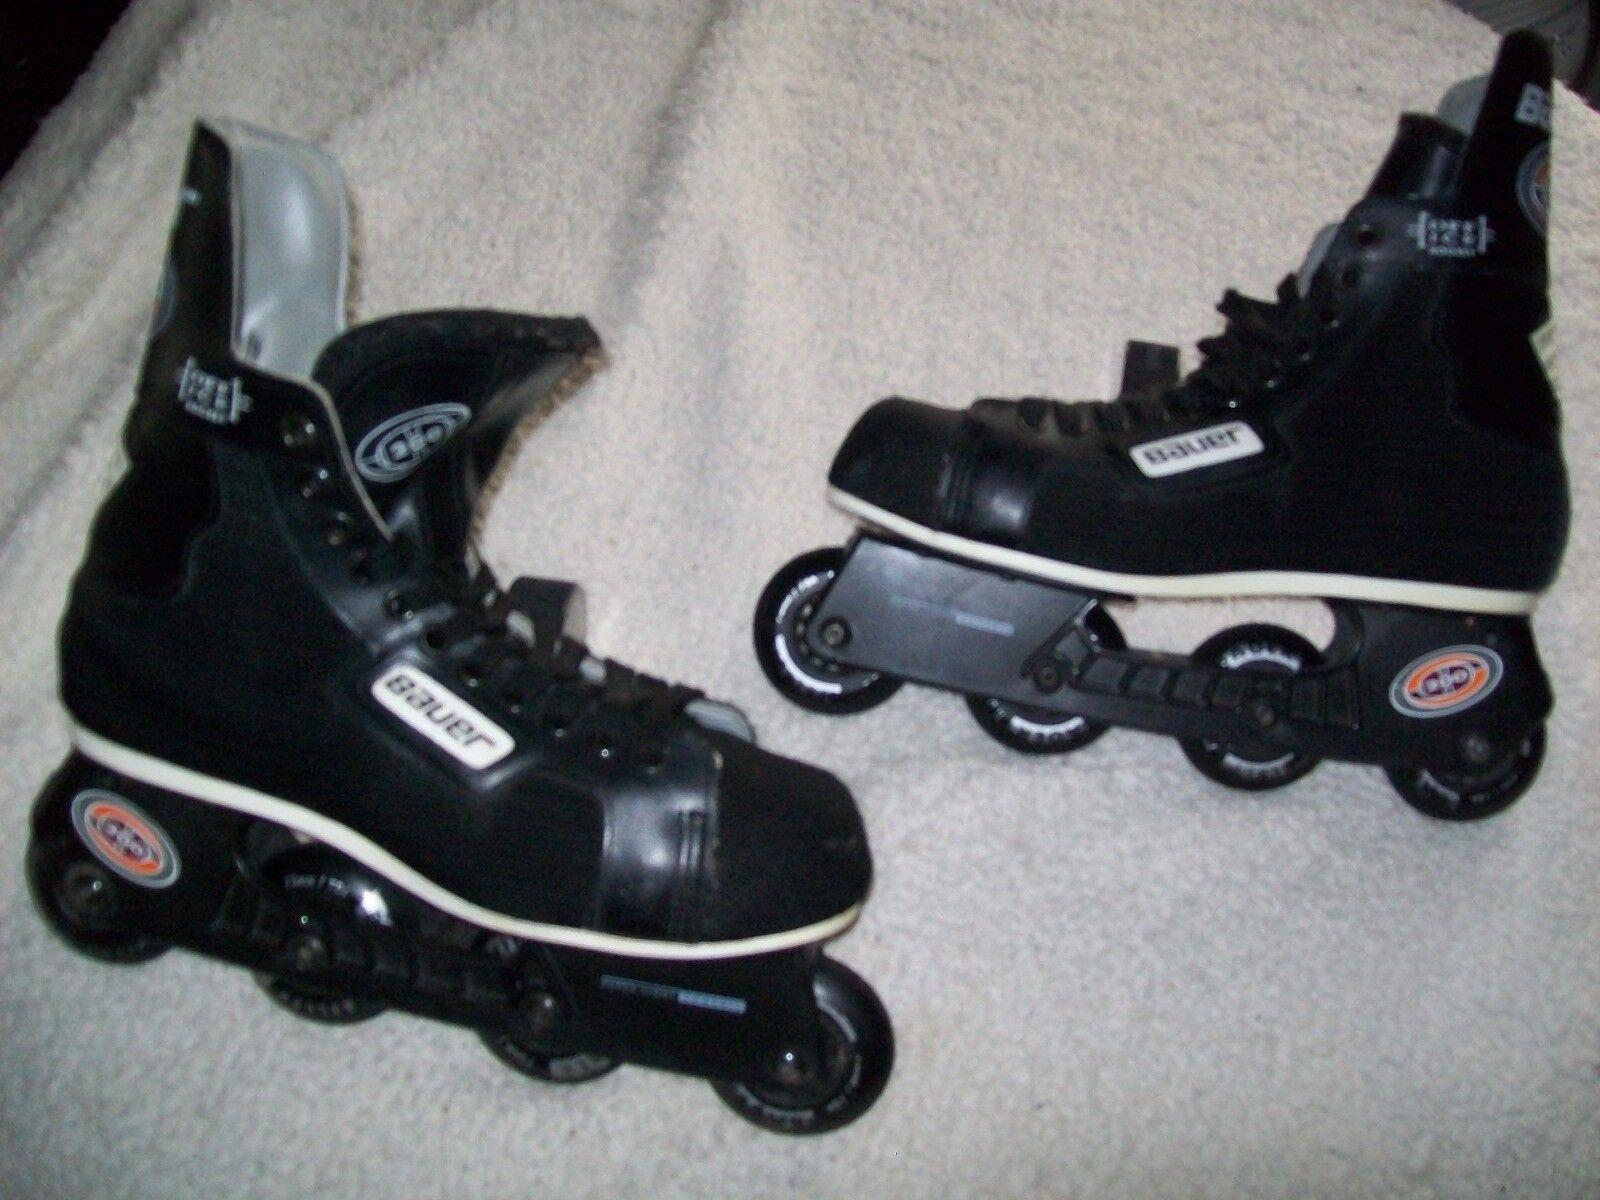 bauer 200 roller hockey skates blades size 10 great shape